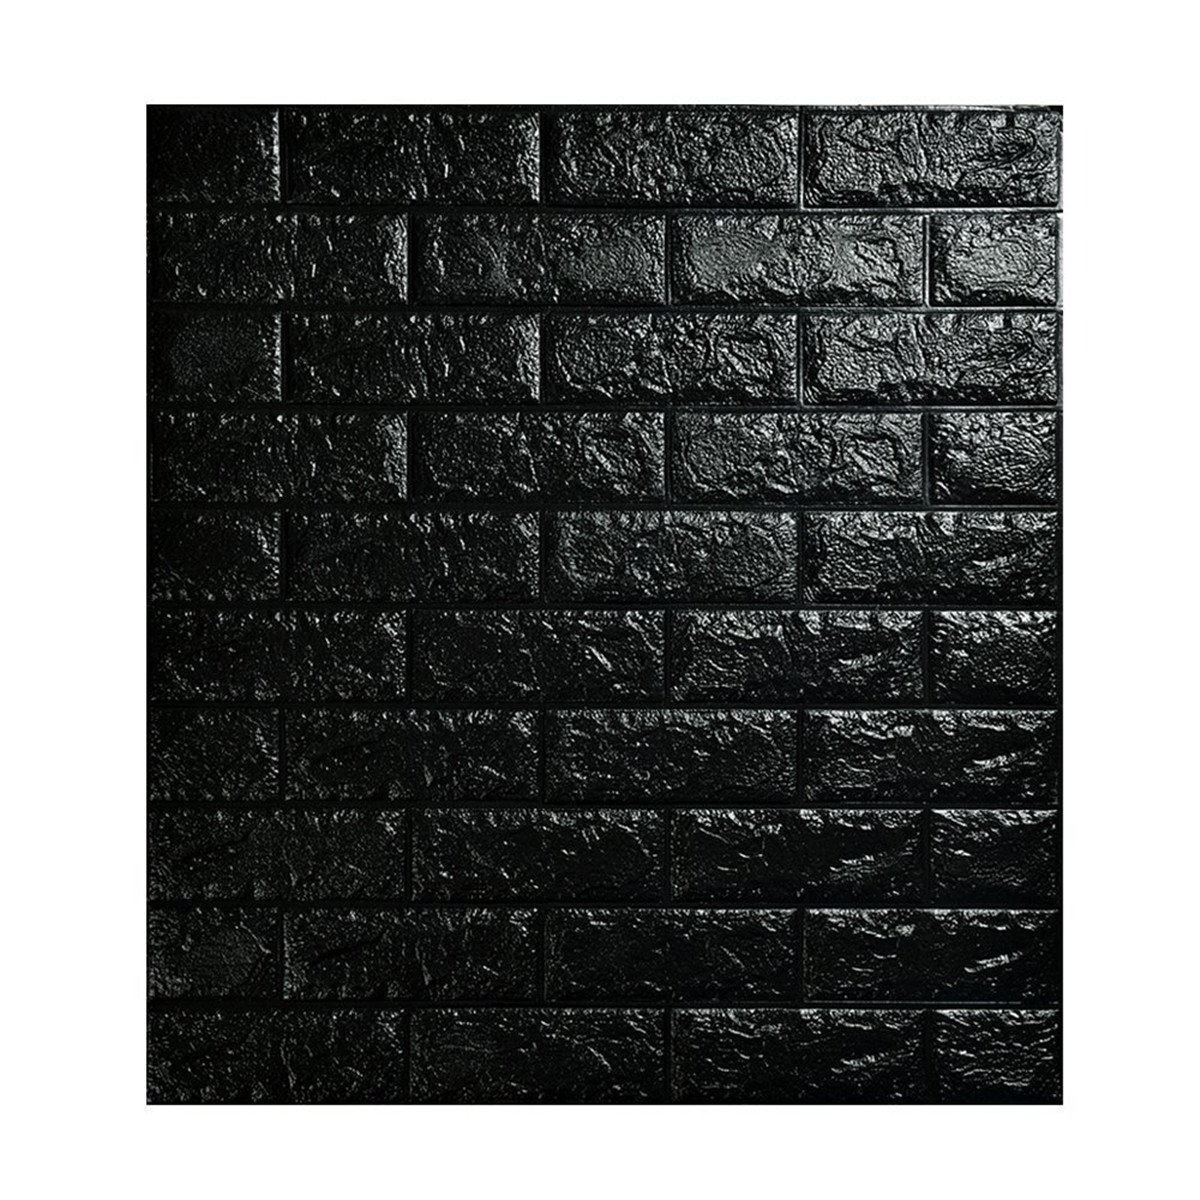 MECCION 3D立体壁紙 DIYレンガ調壁紙シール 70x77CM ウォールステッカー 軽量レンガシール 壁紙シール 自己粘着 防水 多色選択 (ブラック, 5枚入れ) B07D48P5WQ 5枚入れ|ブラック ブラック 5枚入れ